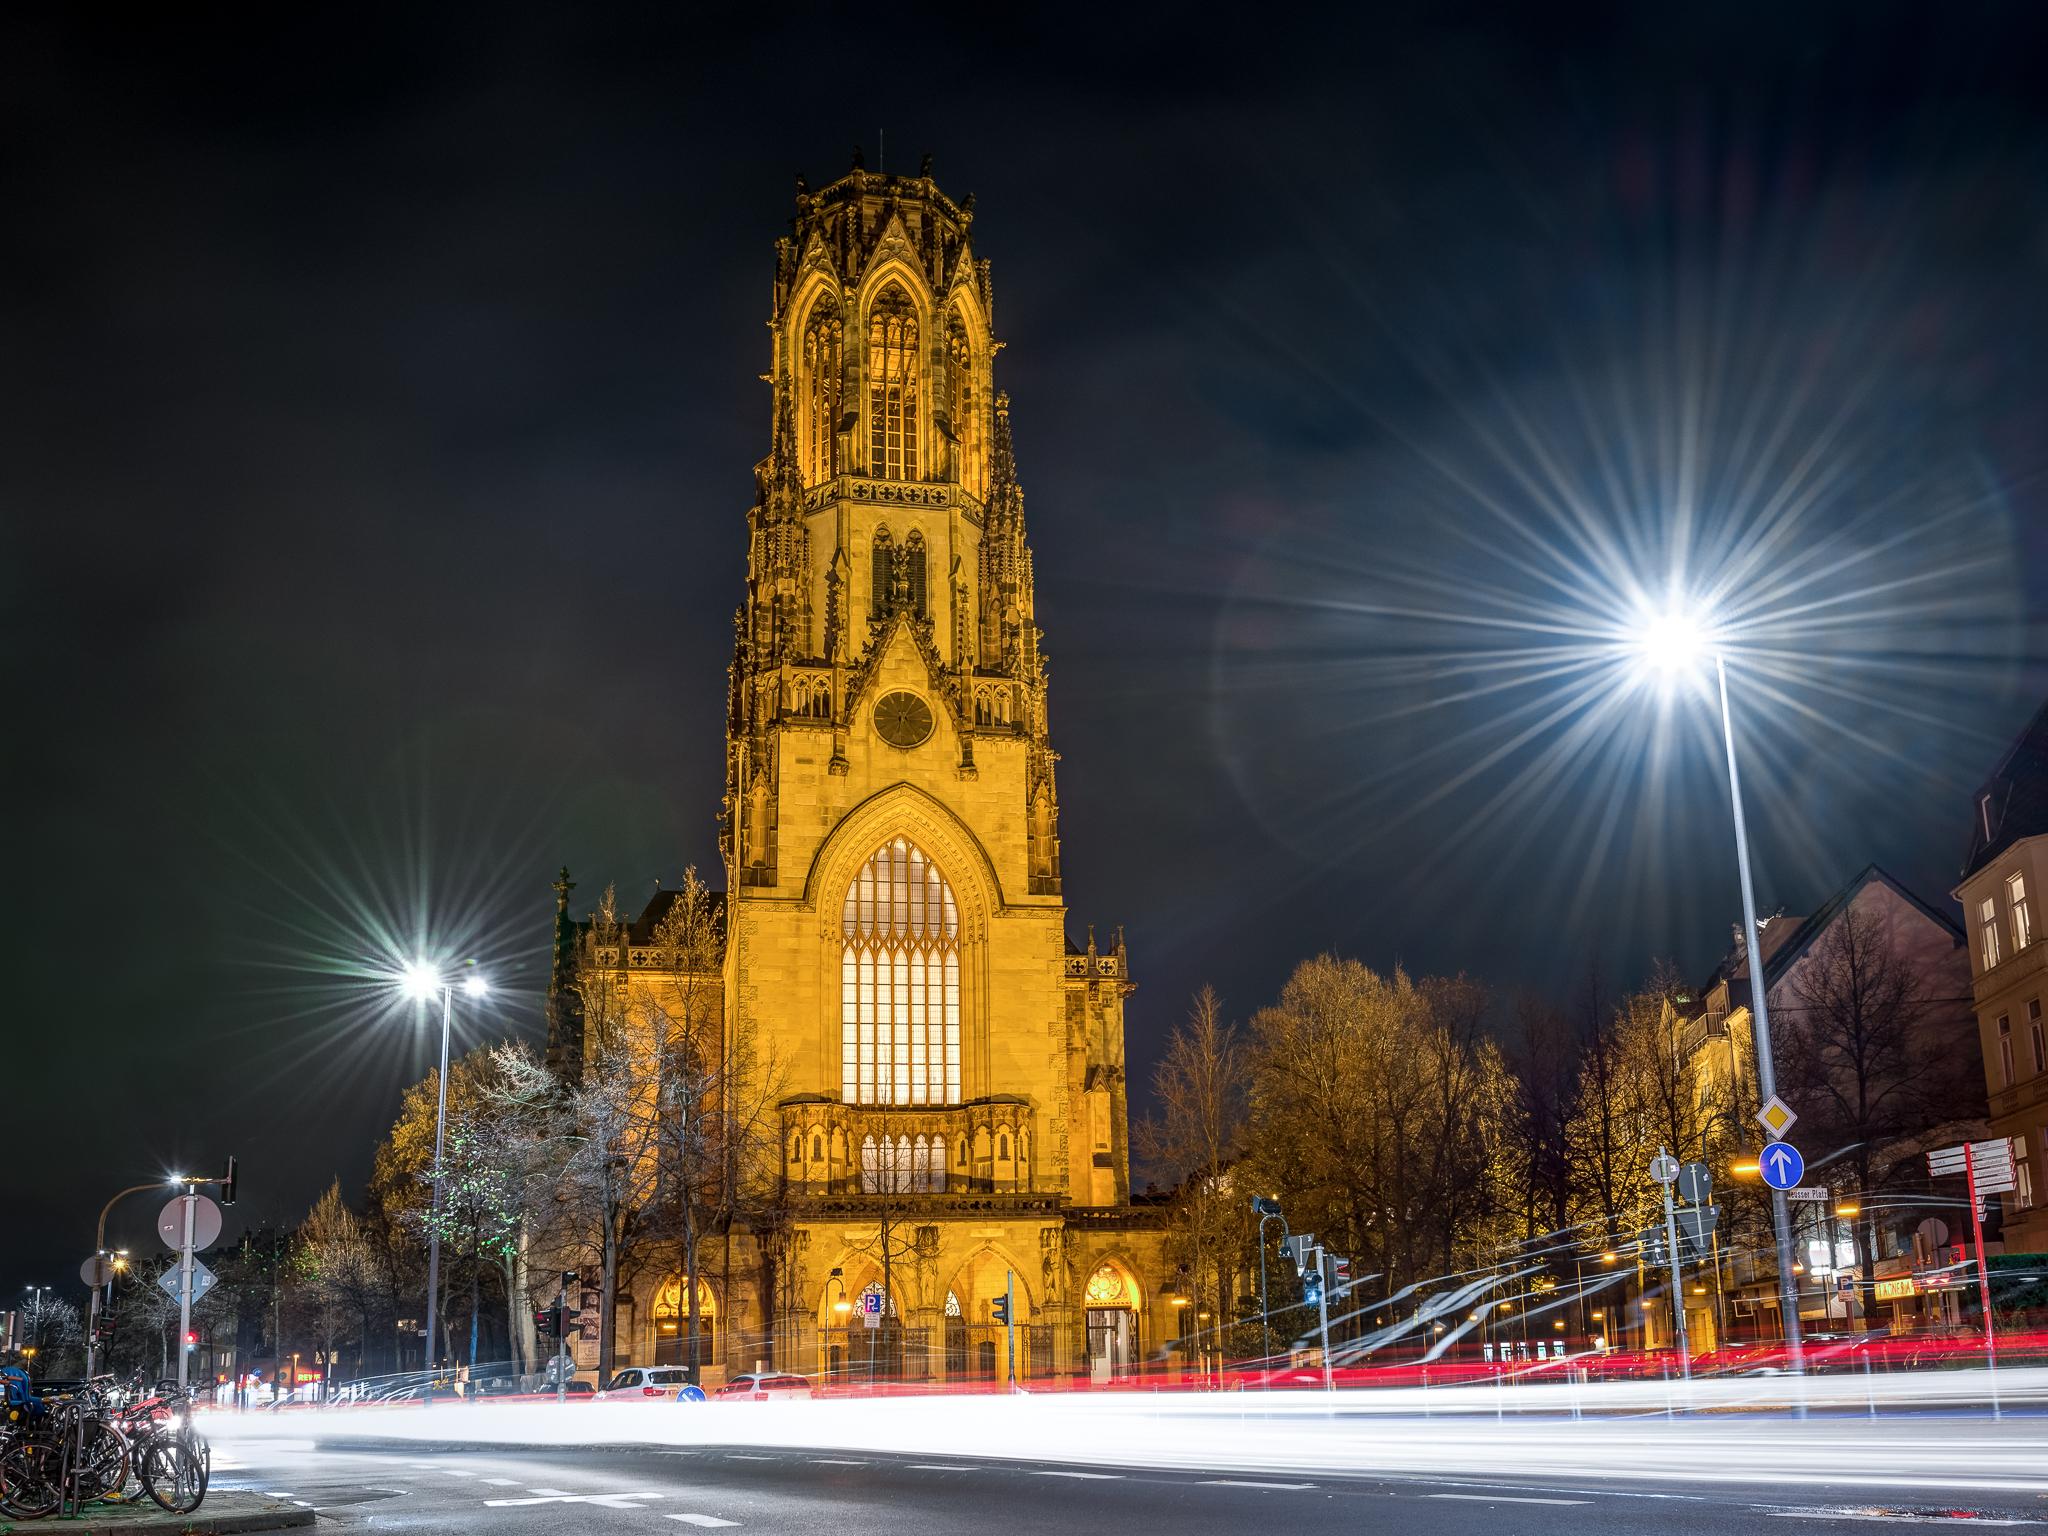 St. Agnes Church, Germany